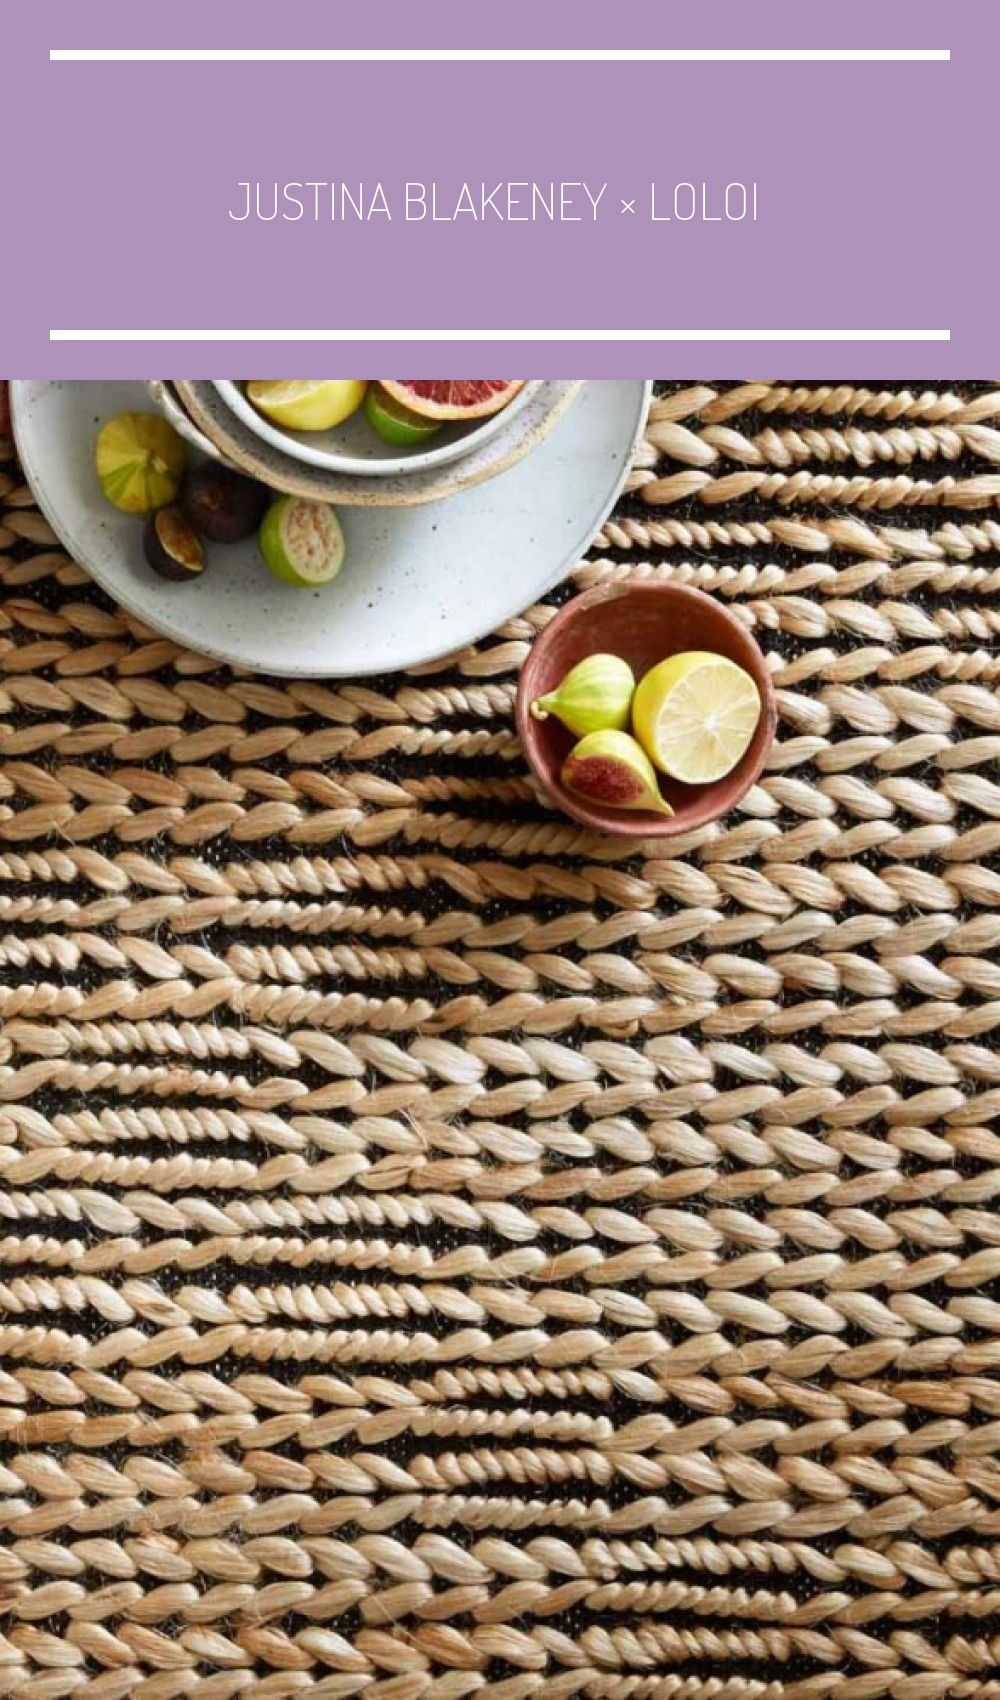 Justina Blakeney × Loloi Playa Dayo Hand Woven Rug